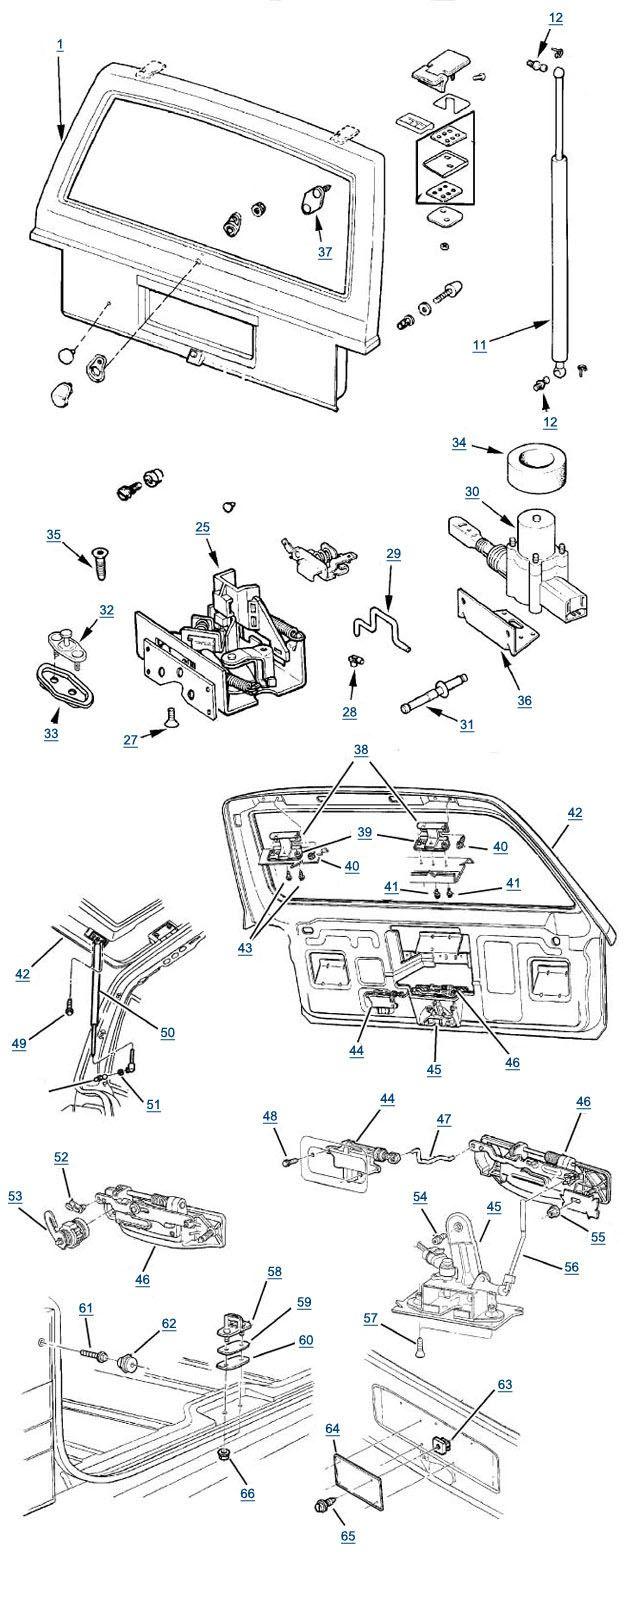 jeep cherokee 4 0 engine diagram car tuning